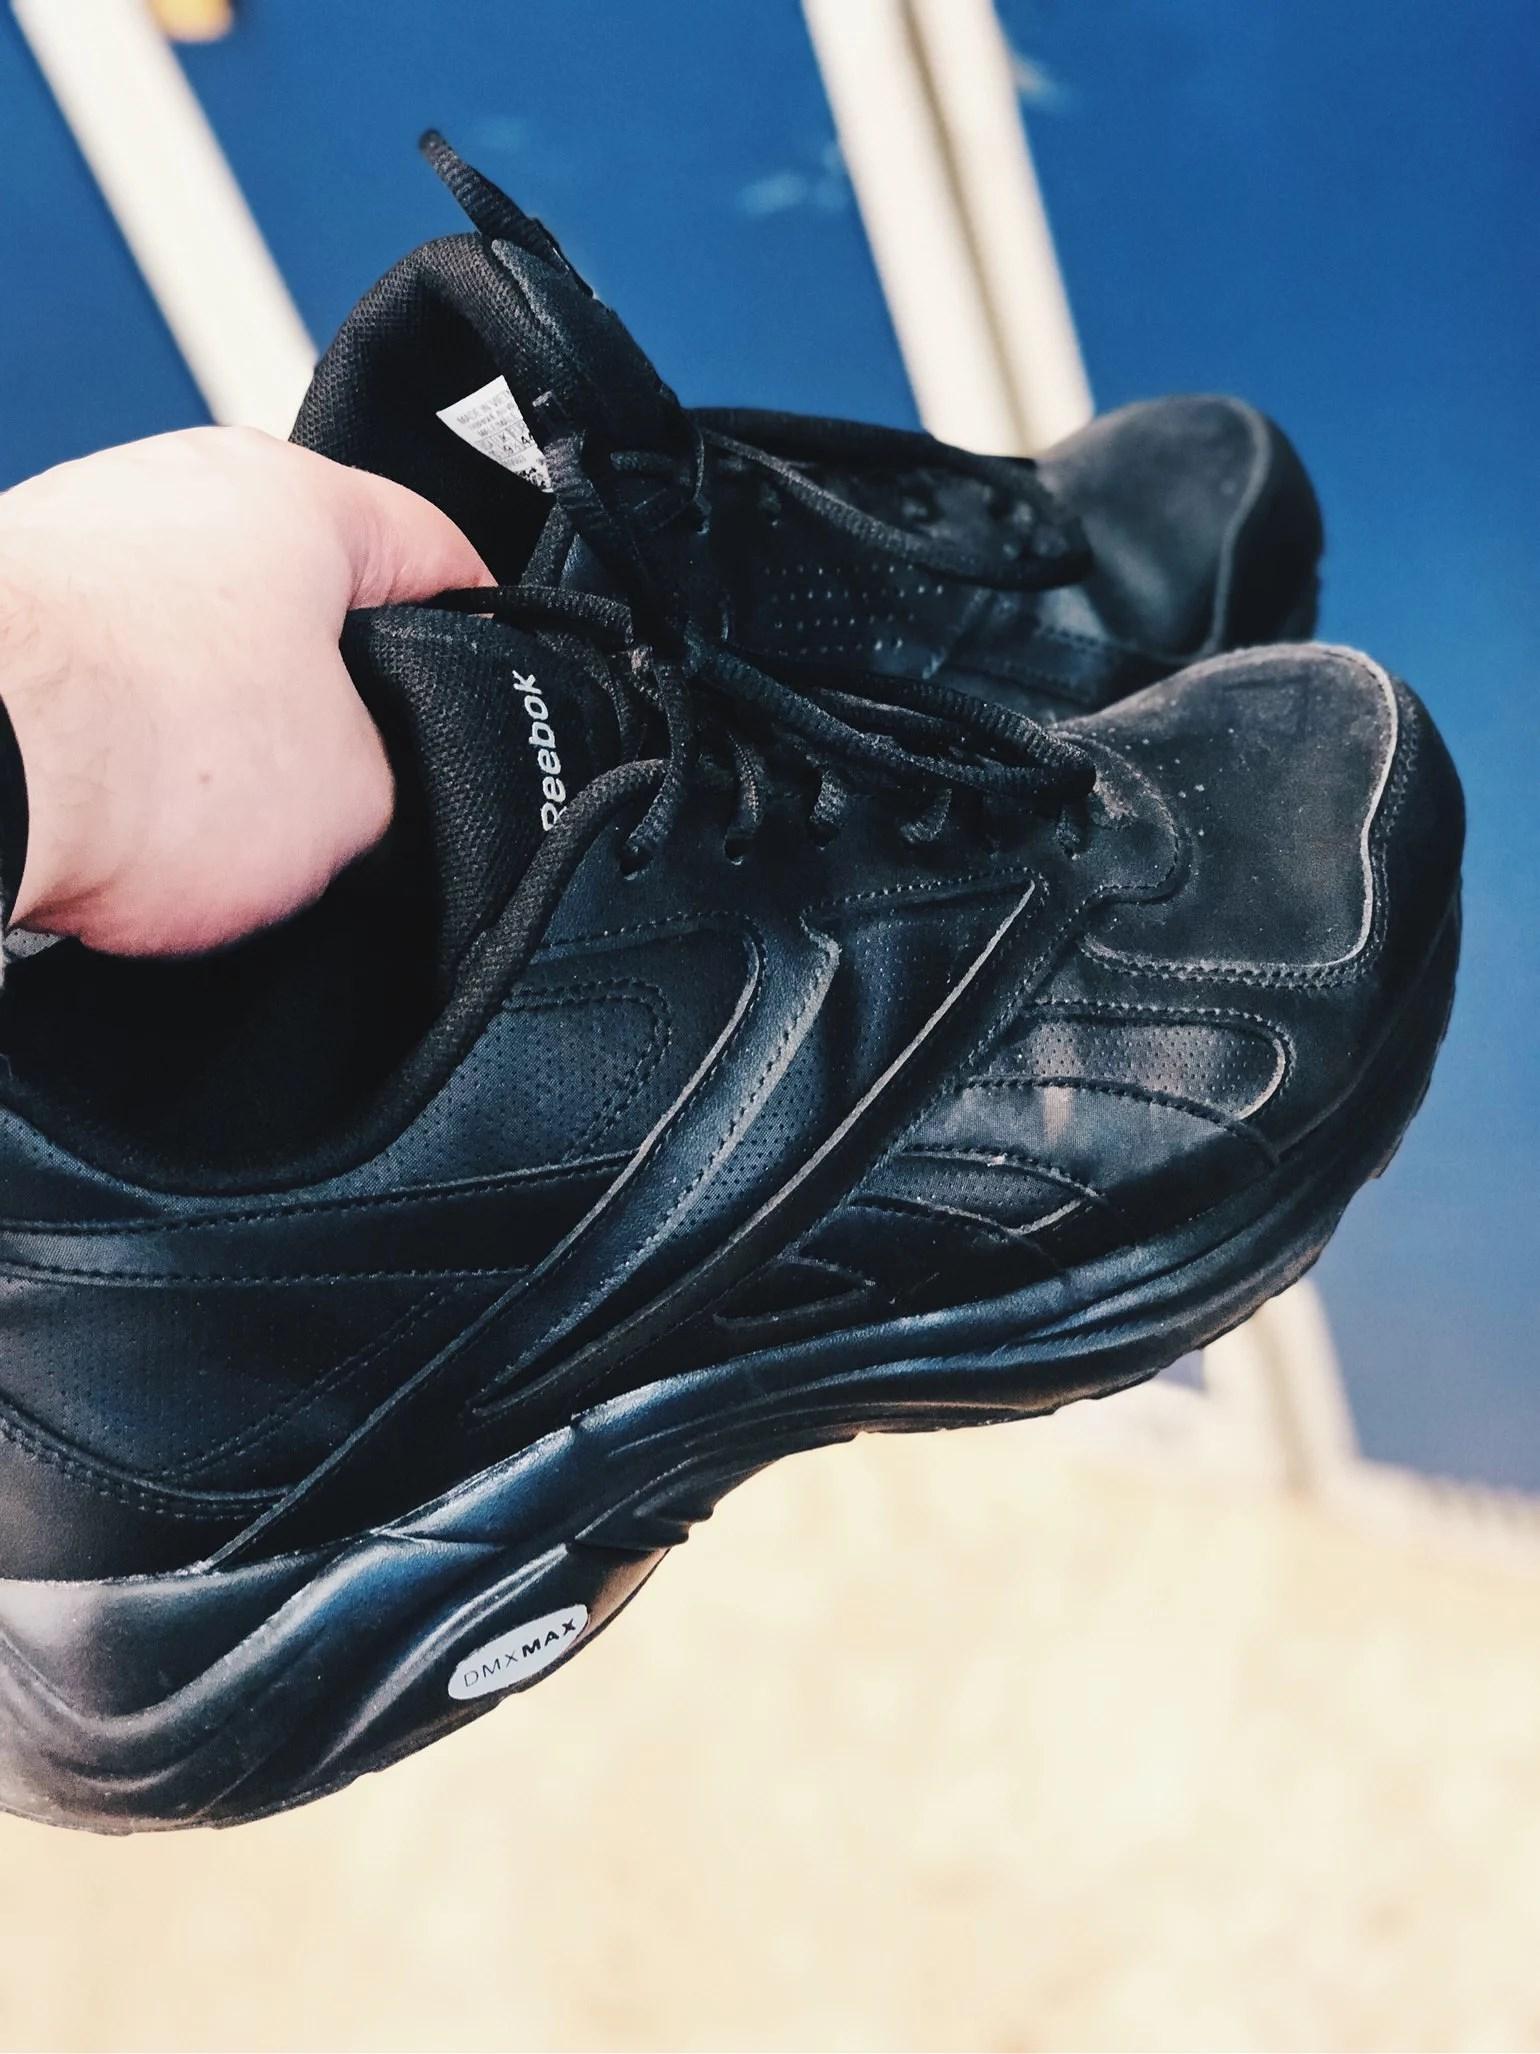 Nya Kicks!